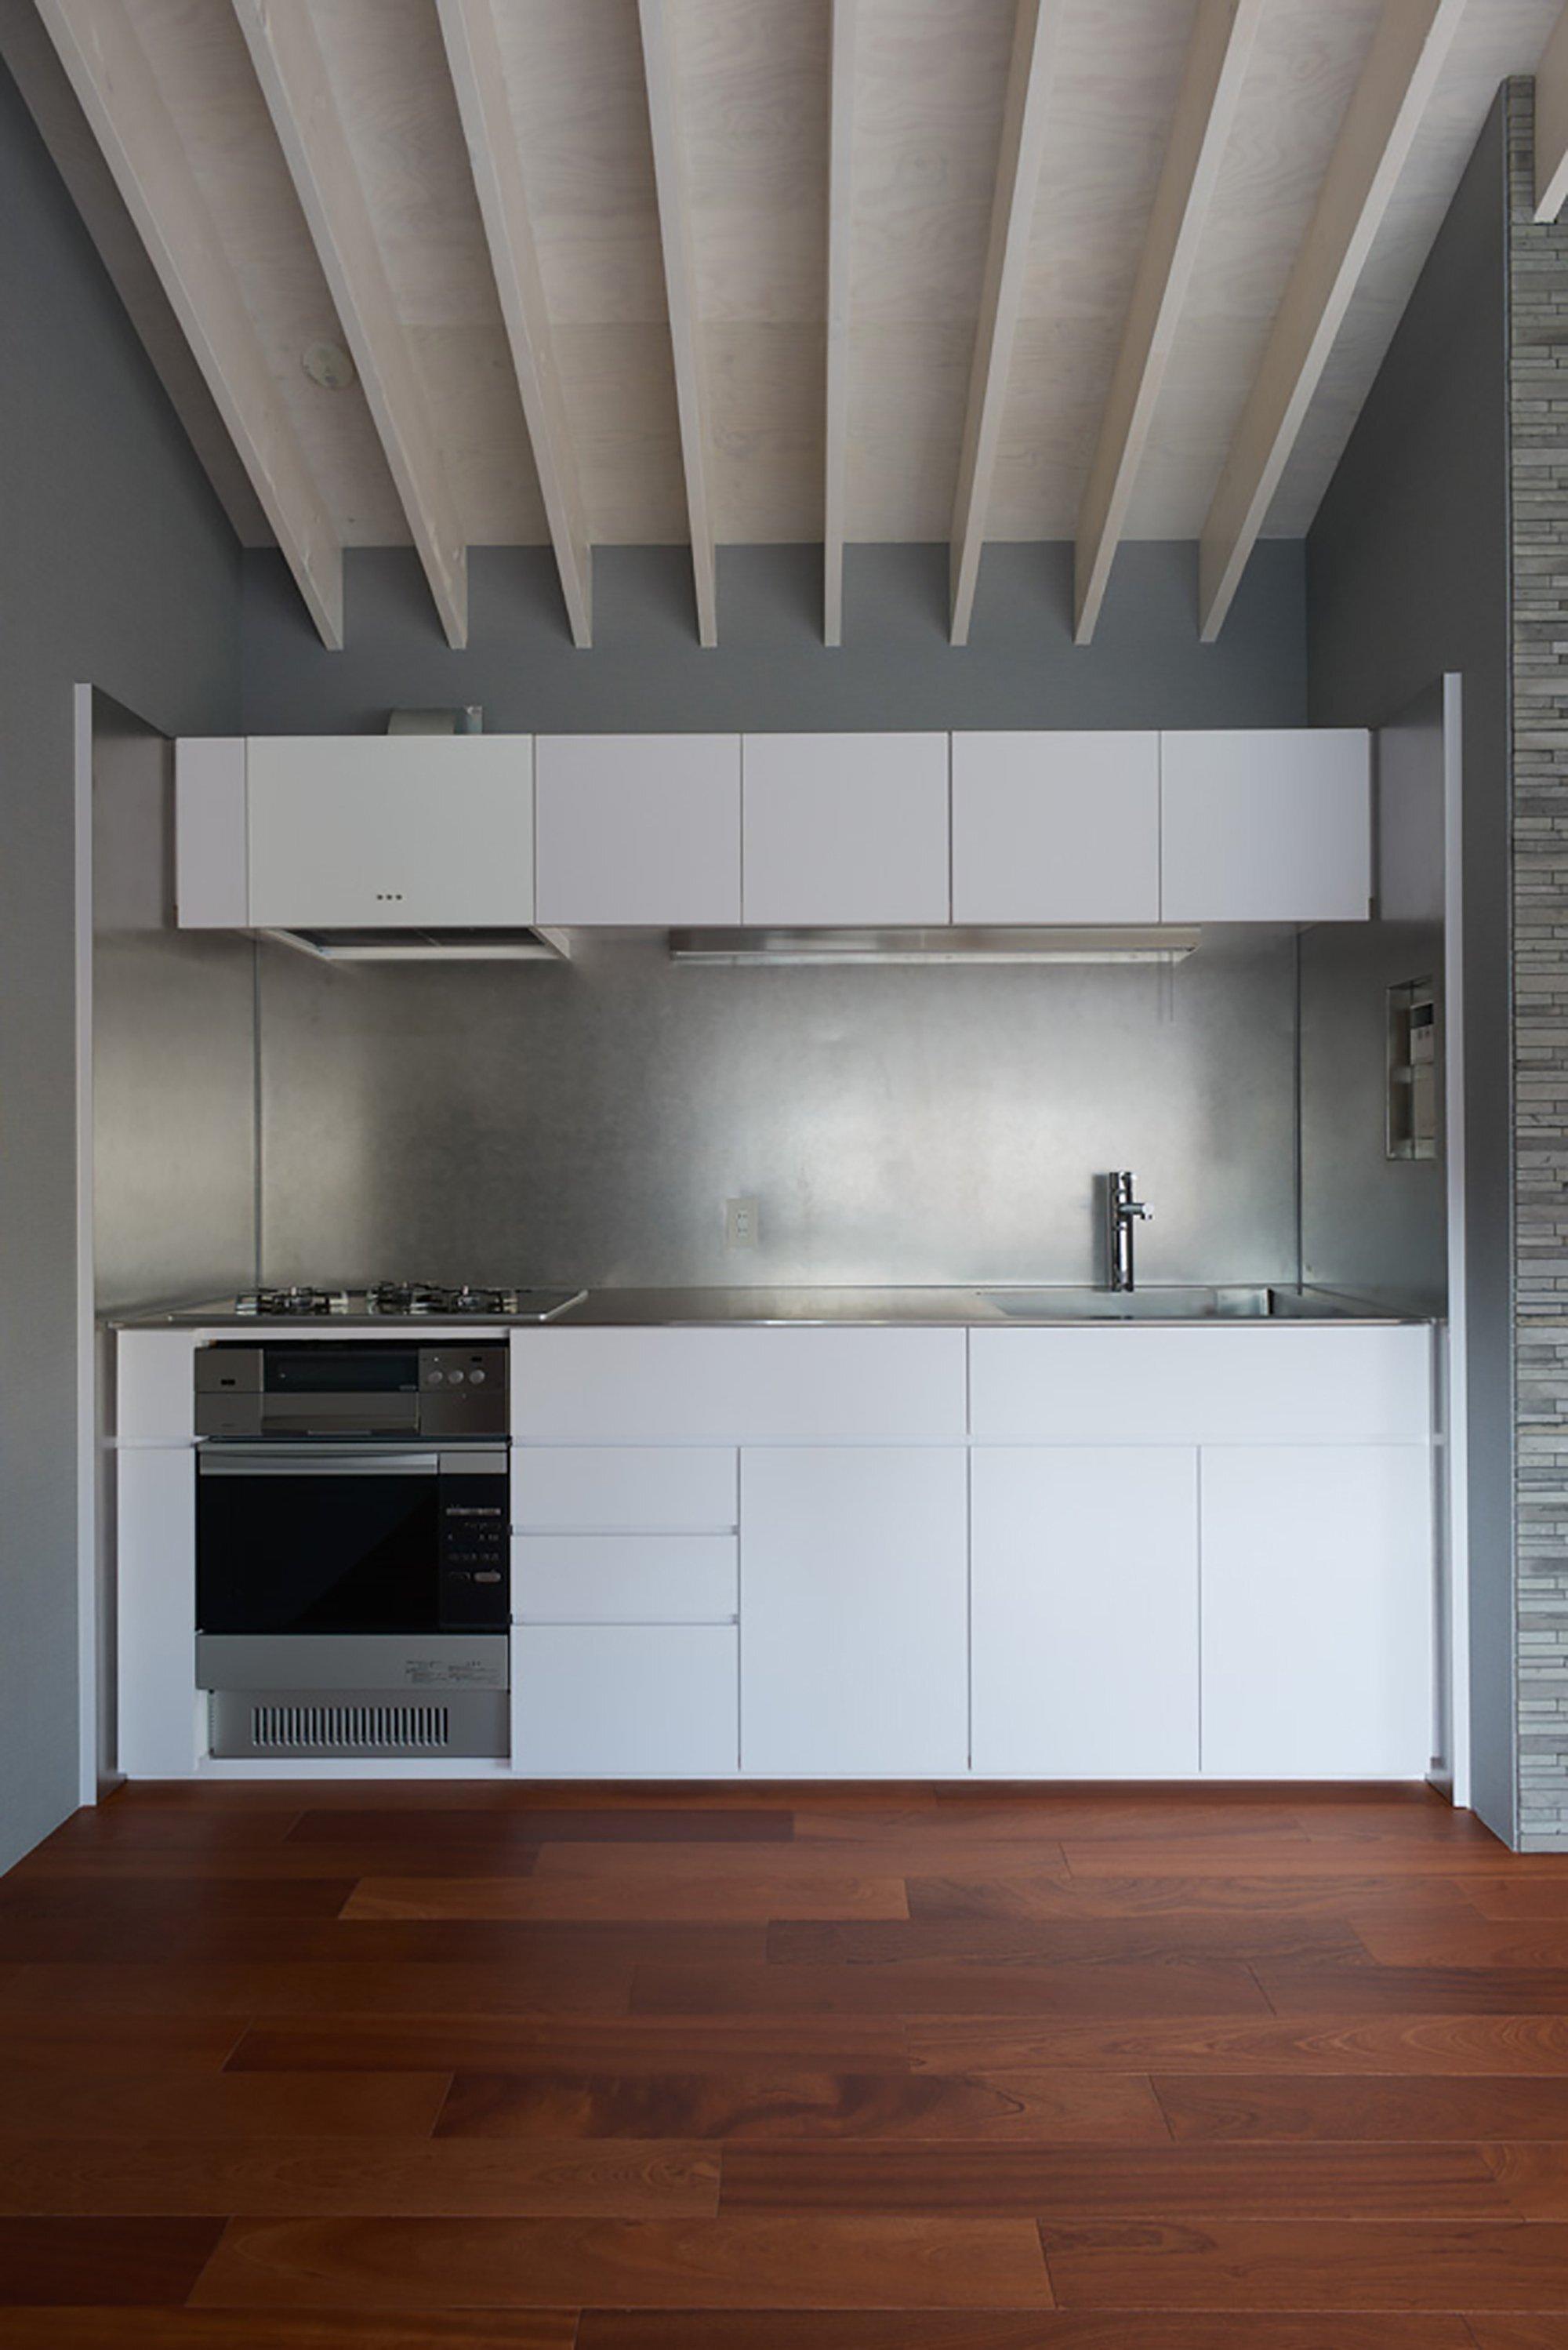 House Ageo - Small House - KASA Architects - Japan - Kitchen - Humble Homes